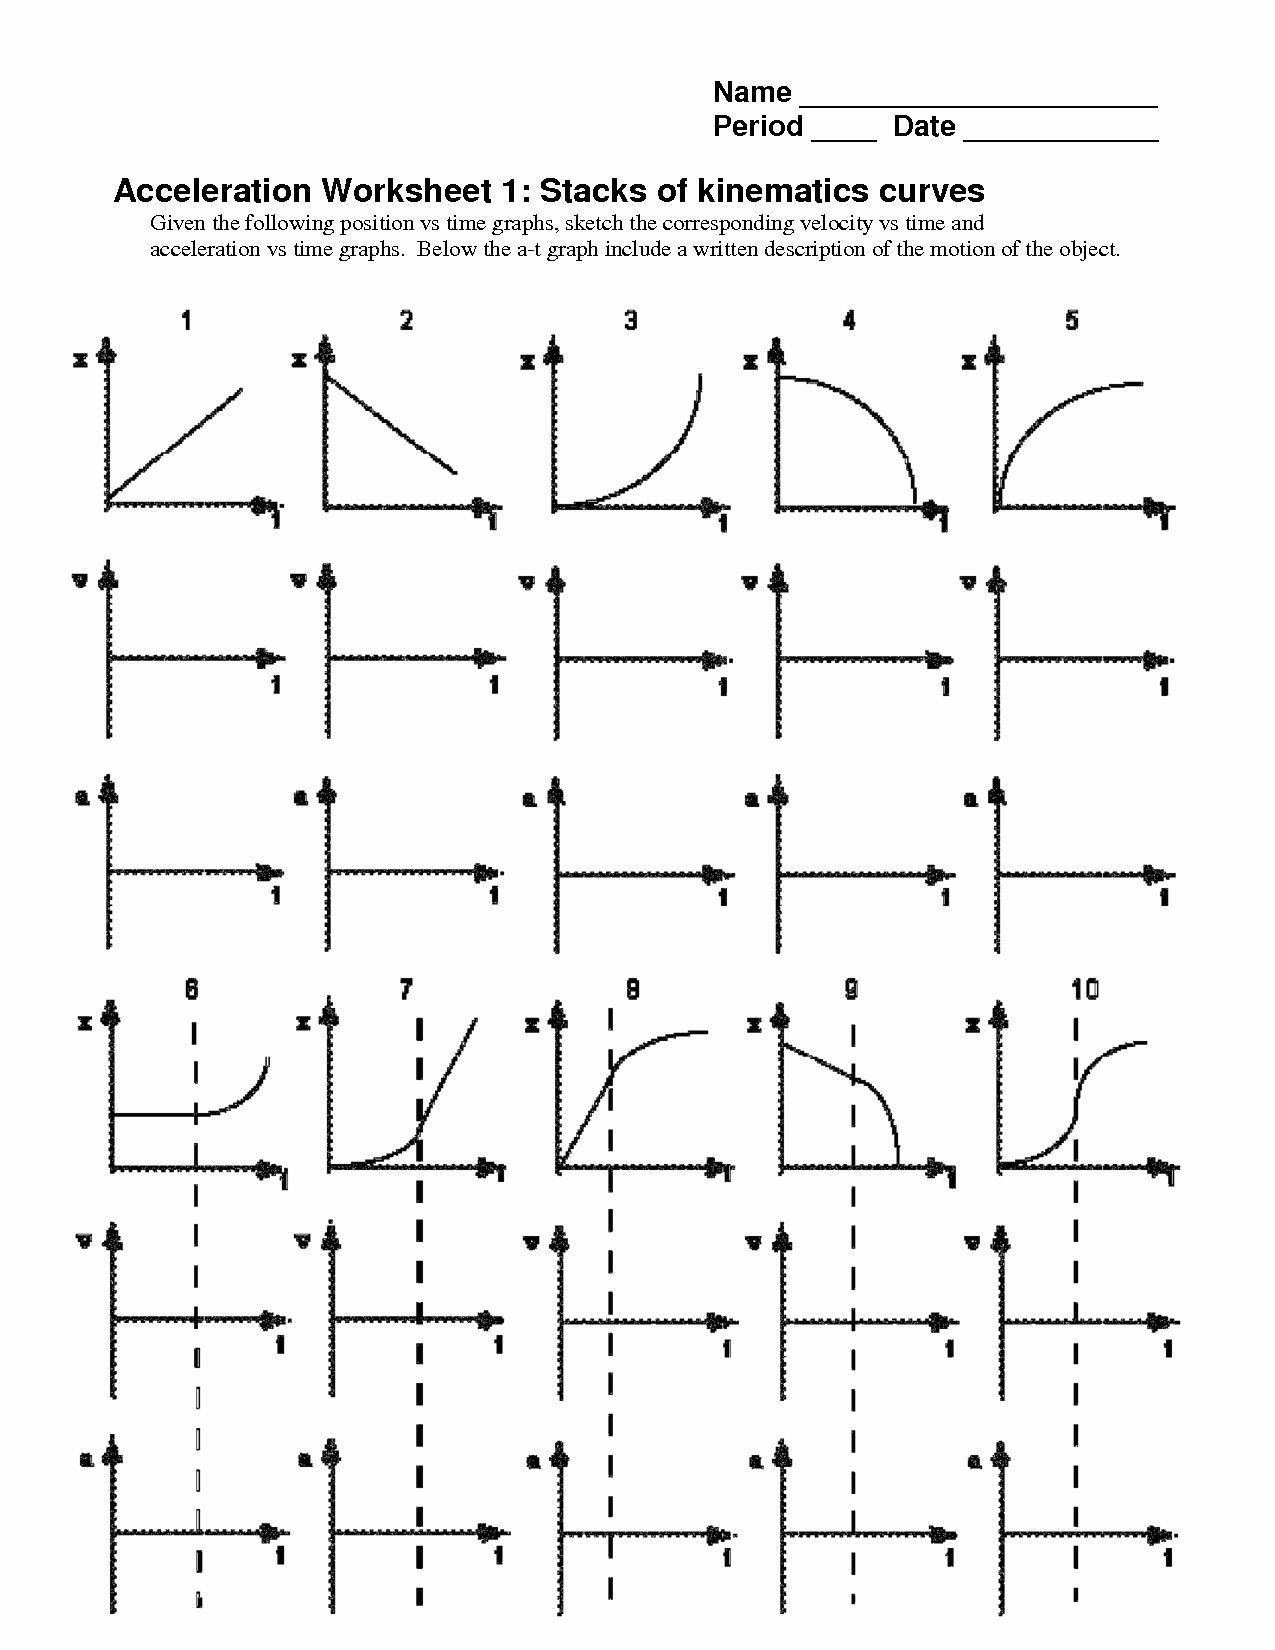 50 Motion Graphysis Worksheet In